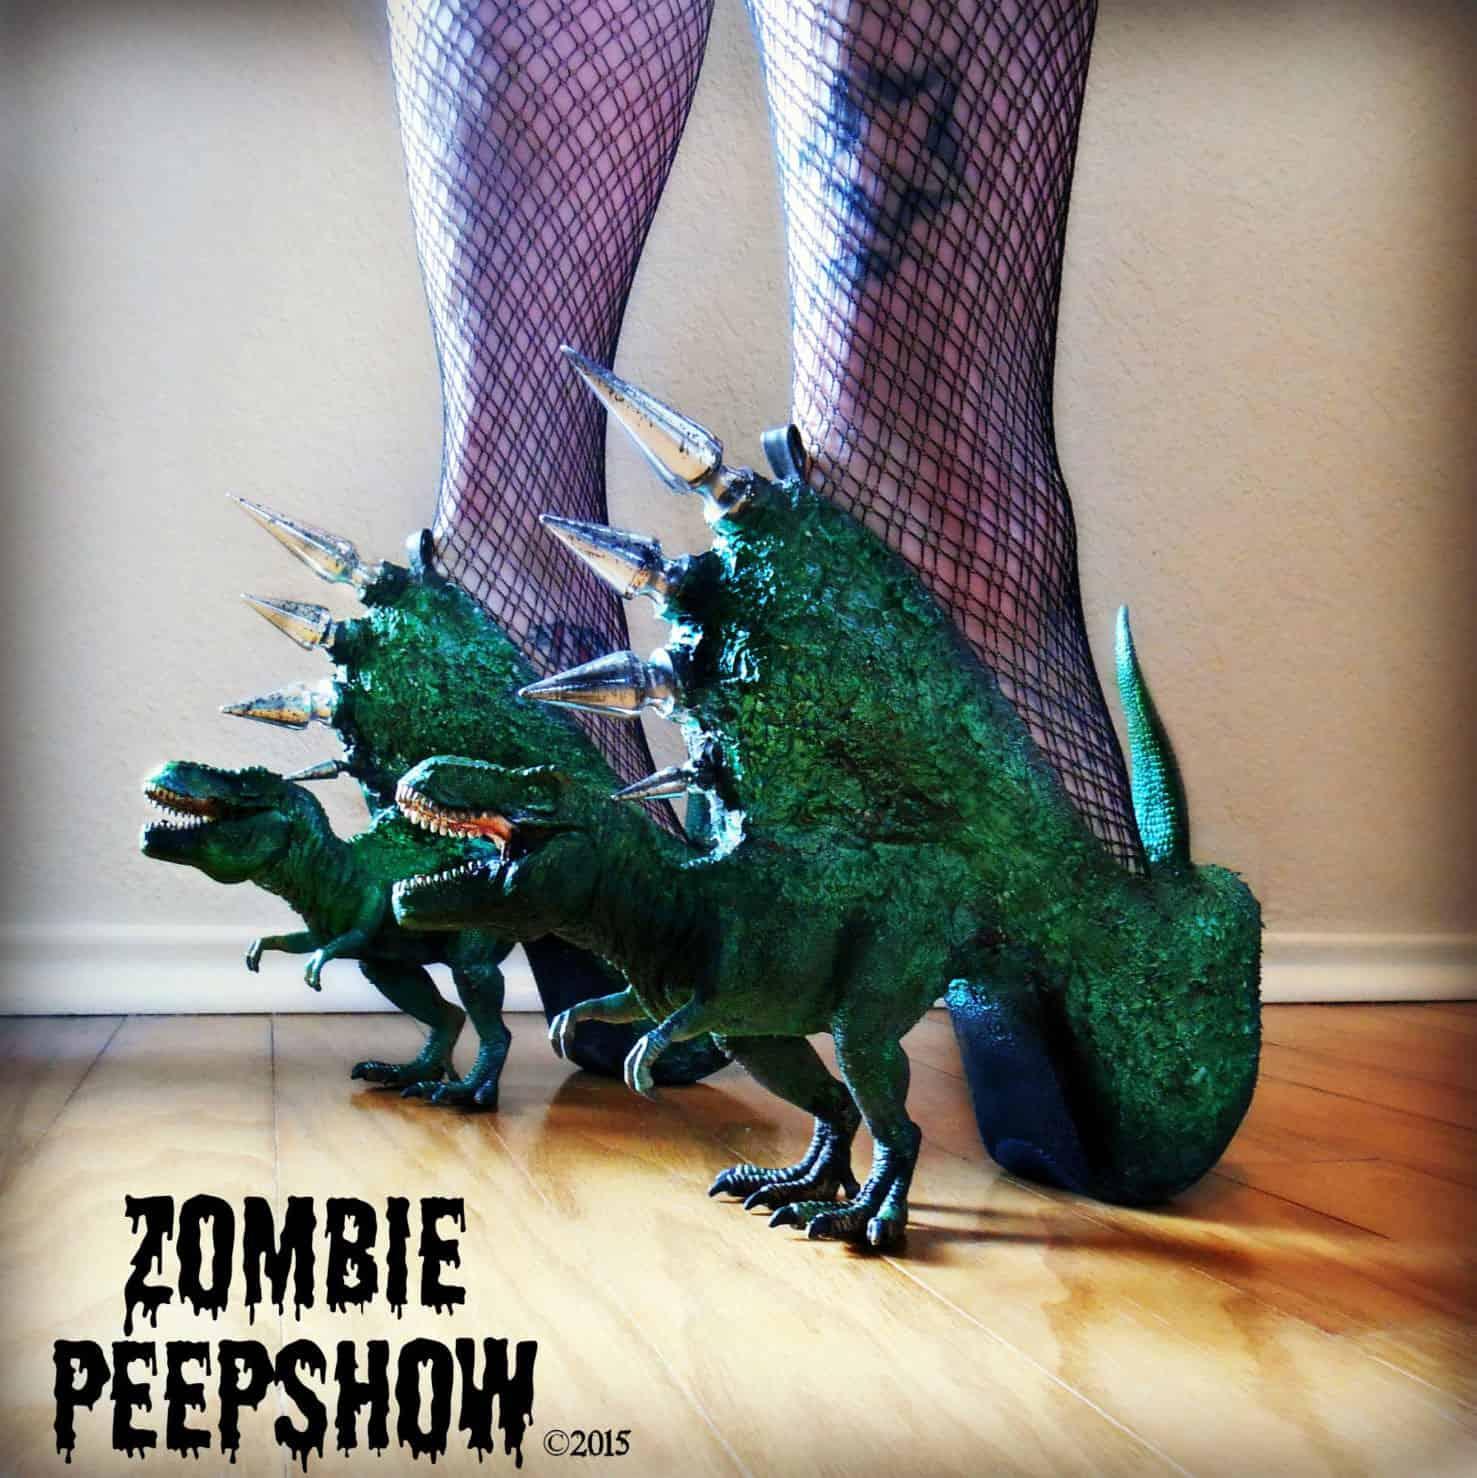 Zombie Peepshow T-Rex Dinosaur Spike Heels Biker Chick Shoes